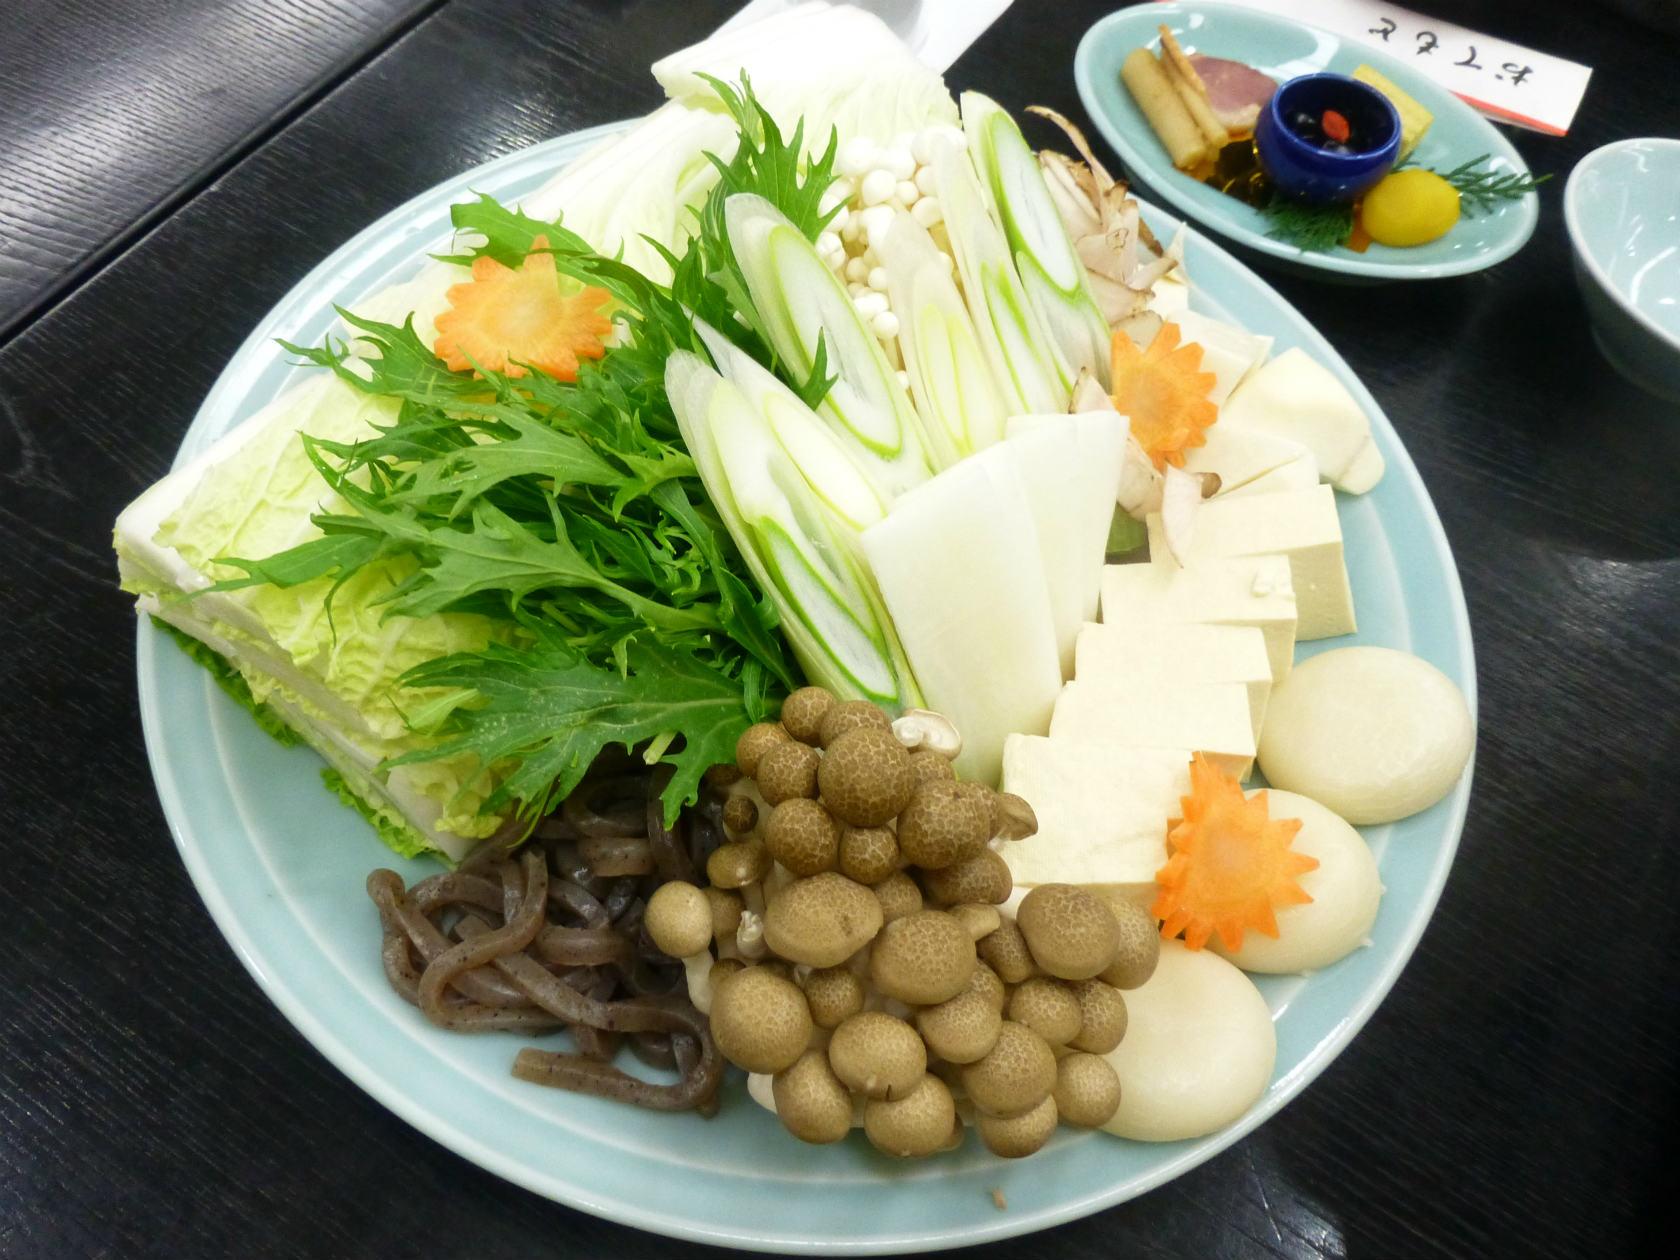 27b ボタン鍋の野菜